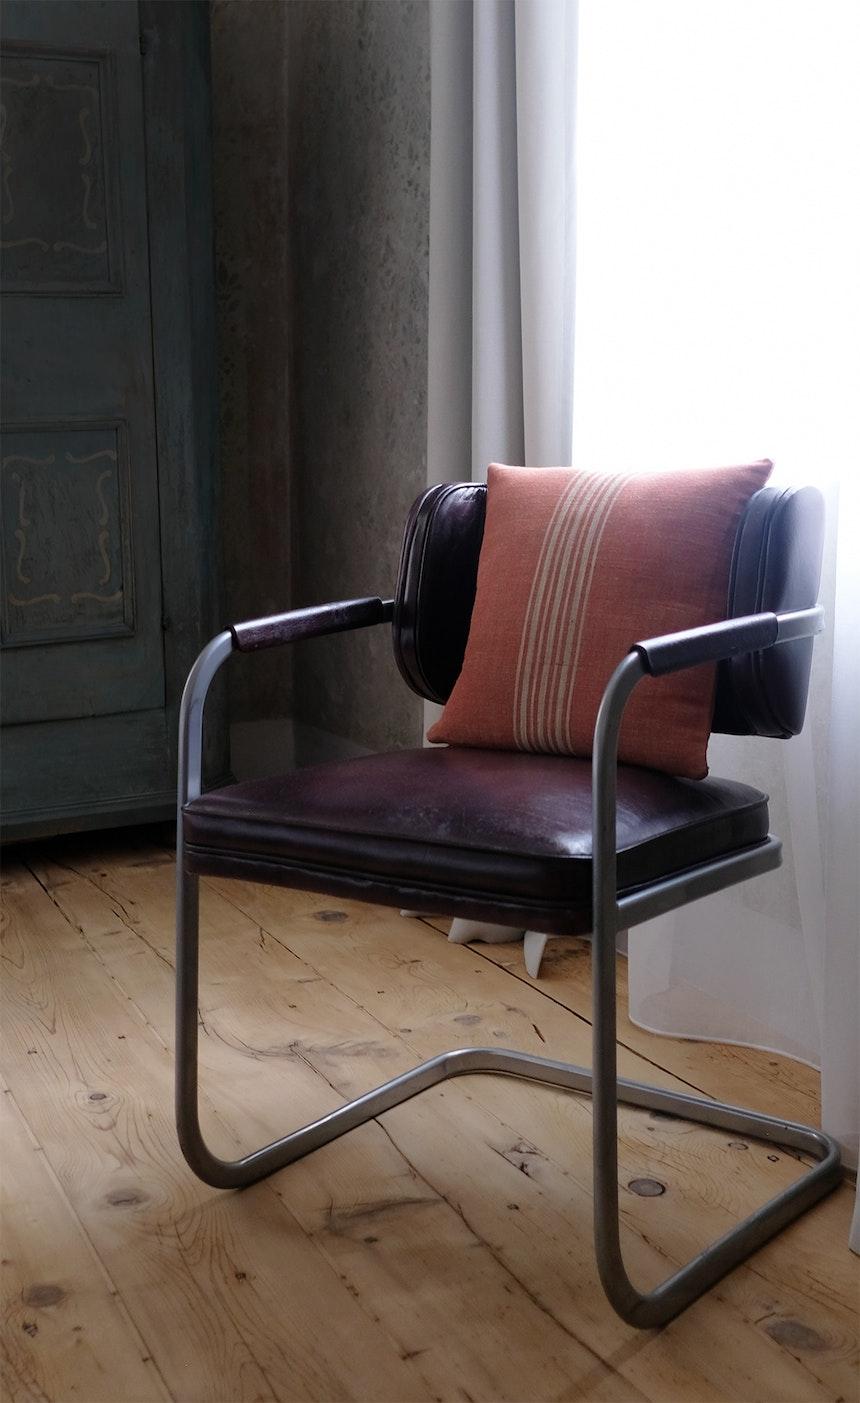 Vintage Thonet & Leinen